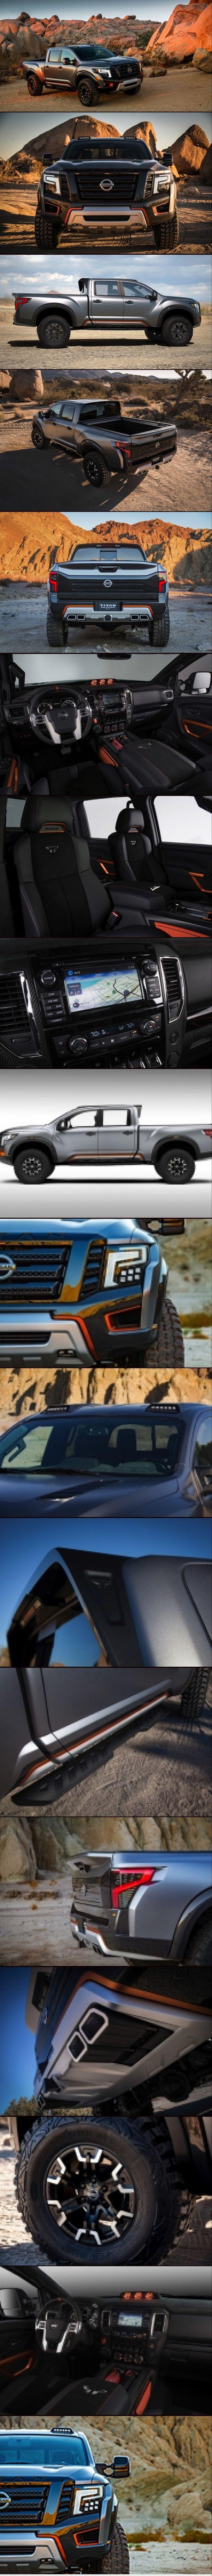 Nissan highlights amplified Titan Warrior Concept at 2016 NAIAS